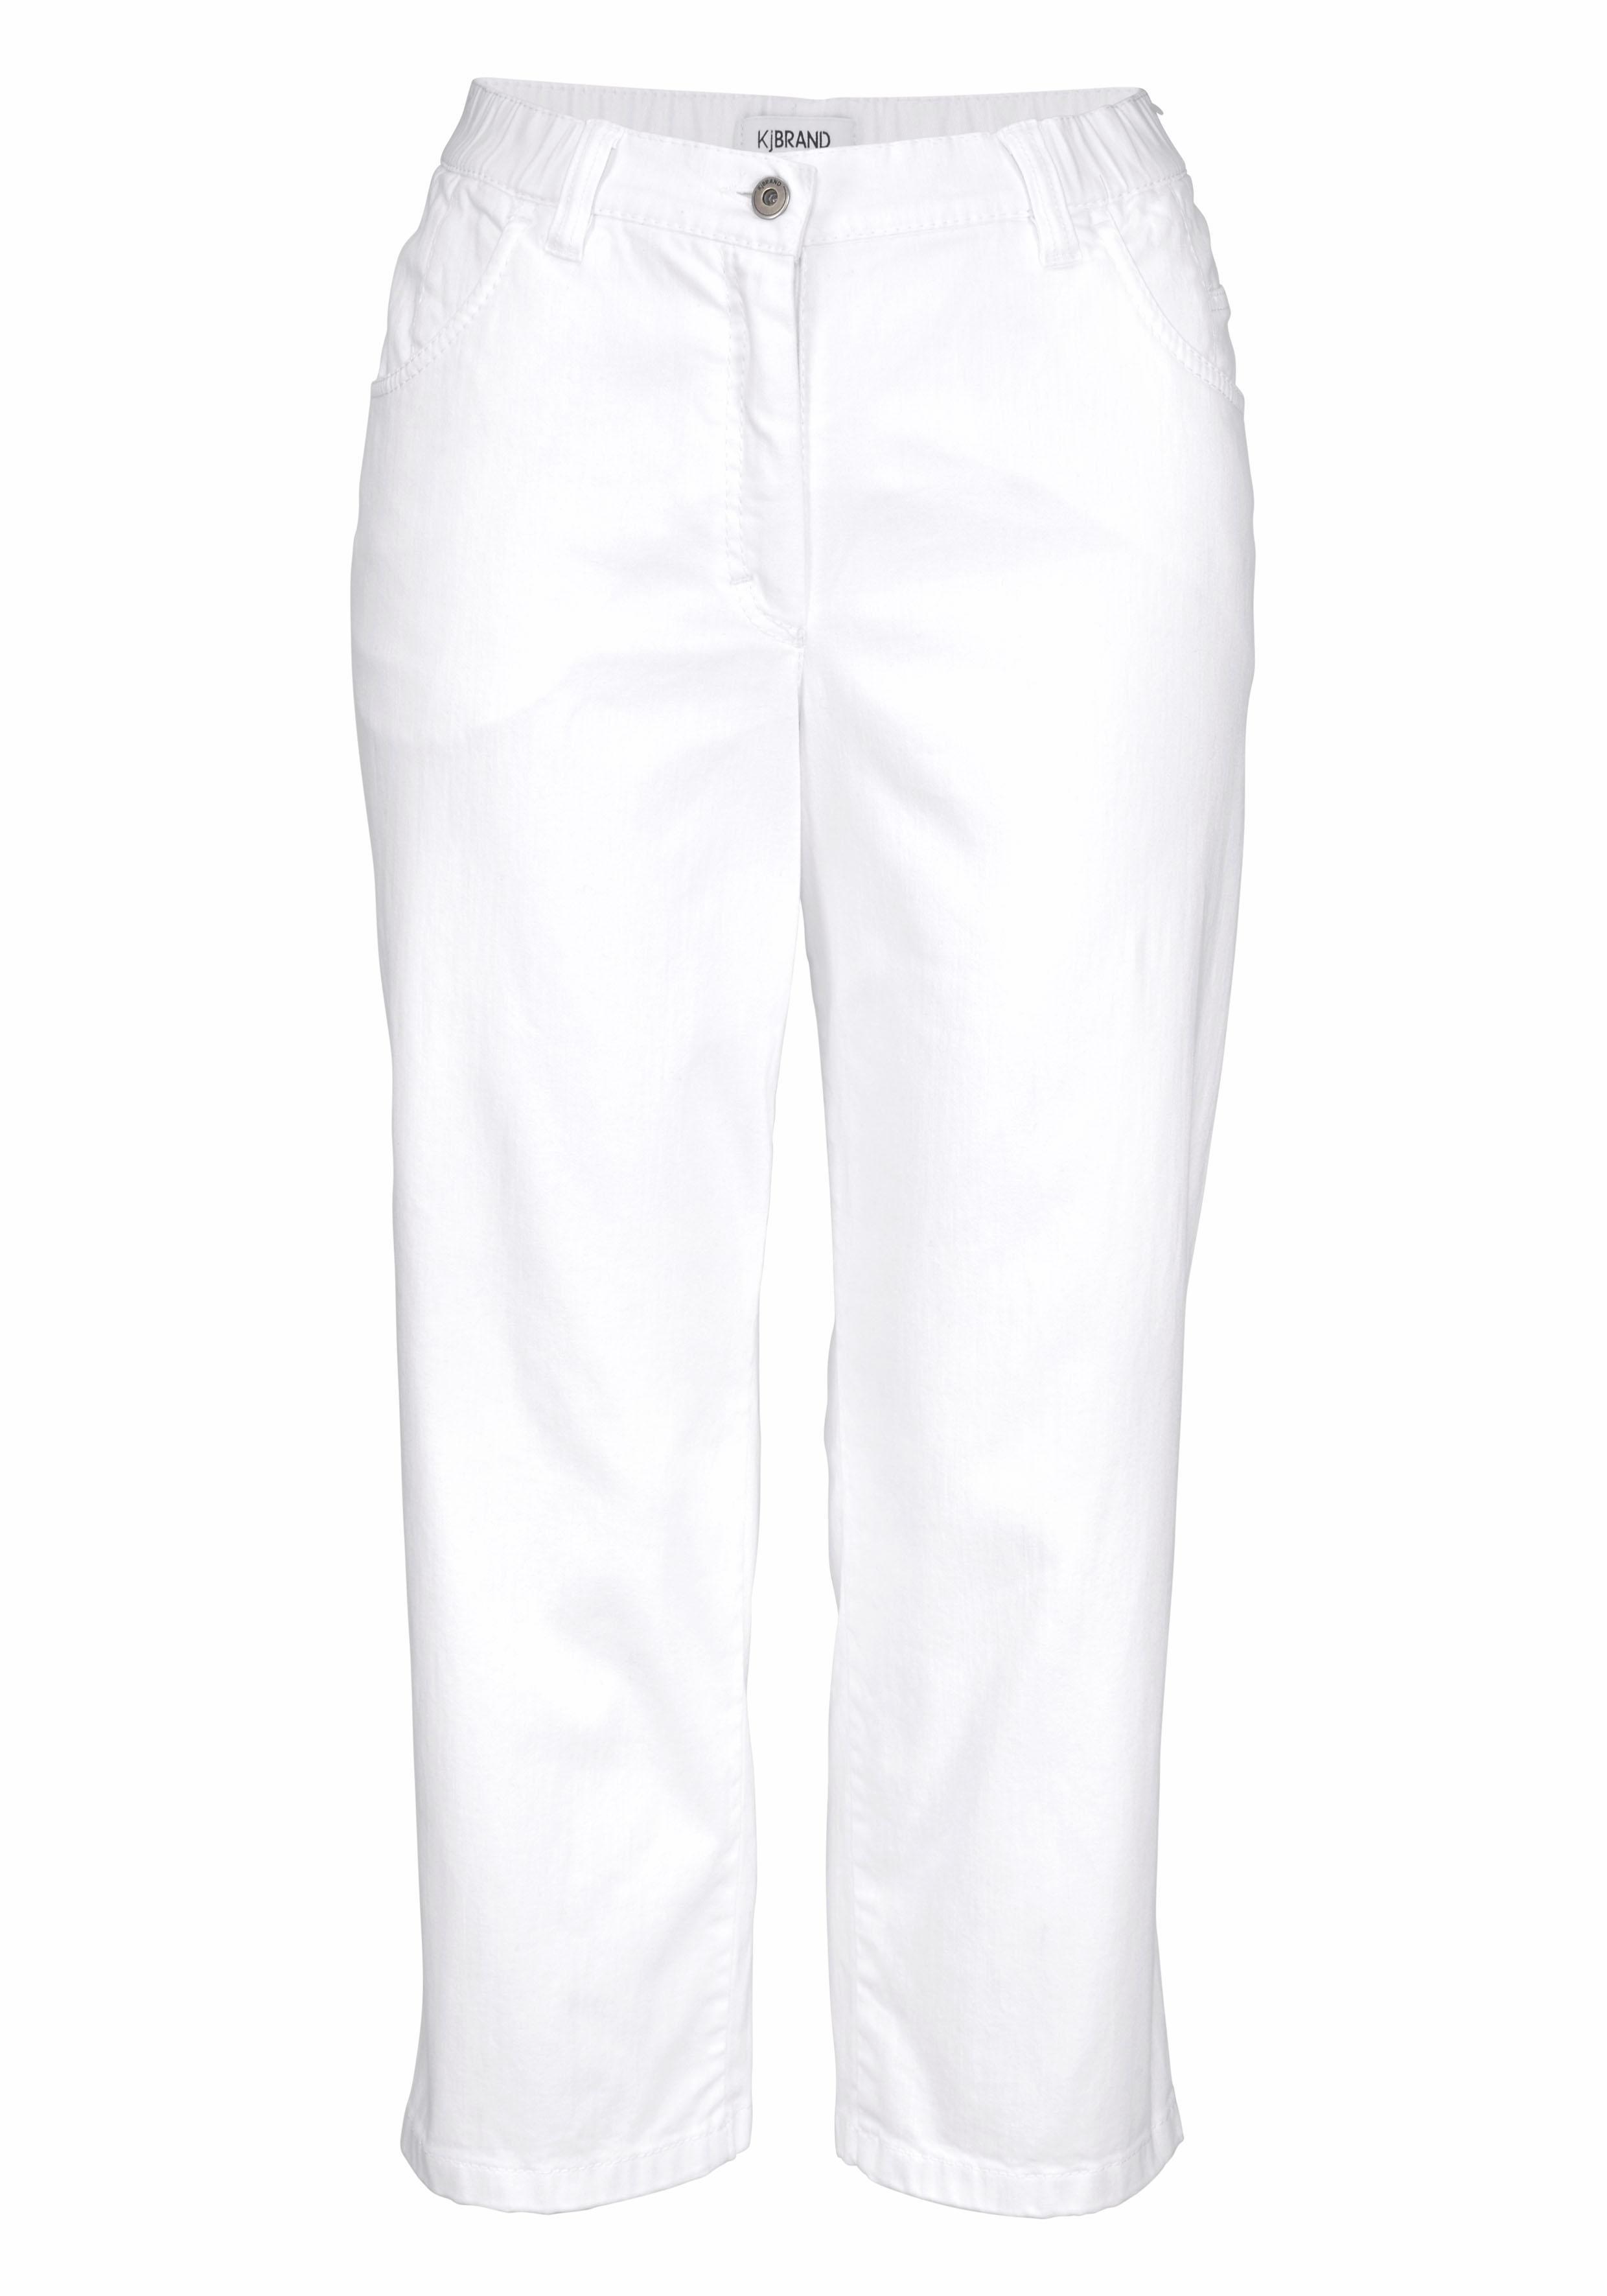 8 Kjbrand 7 Bestellen jeansbabsie Nu 8 7 Online oerCxdWB